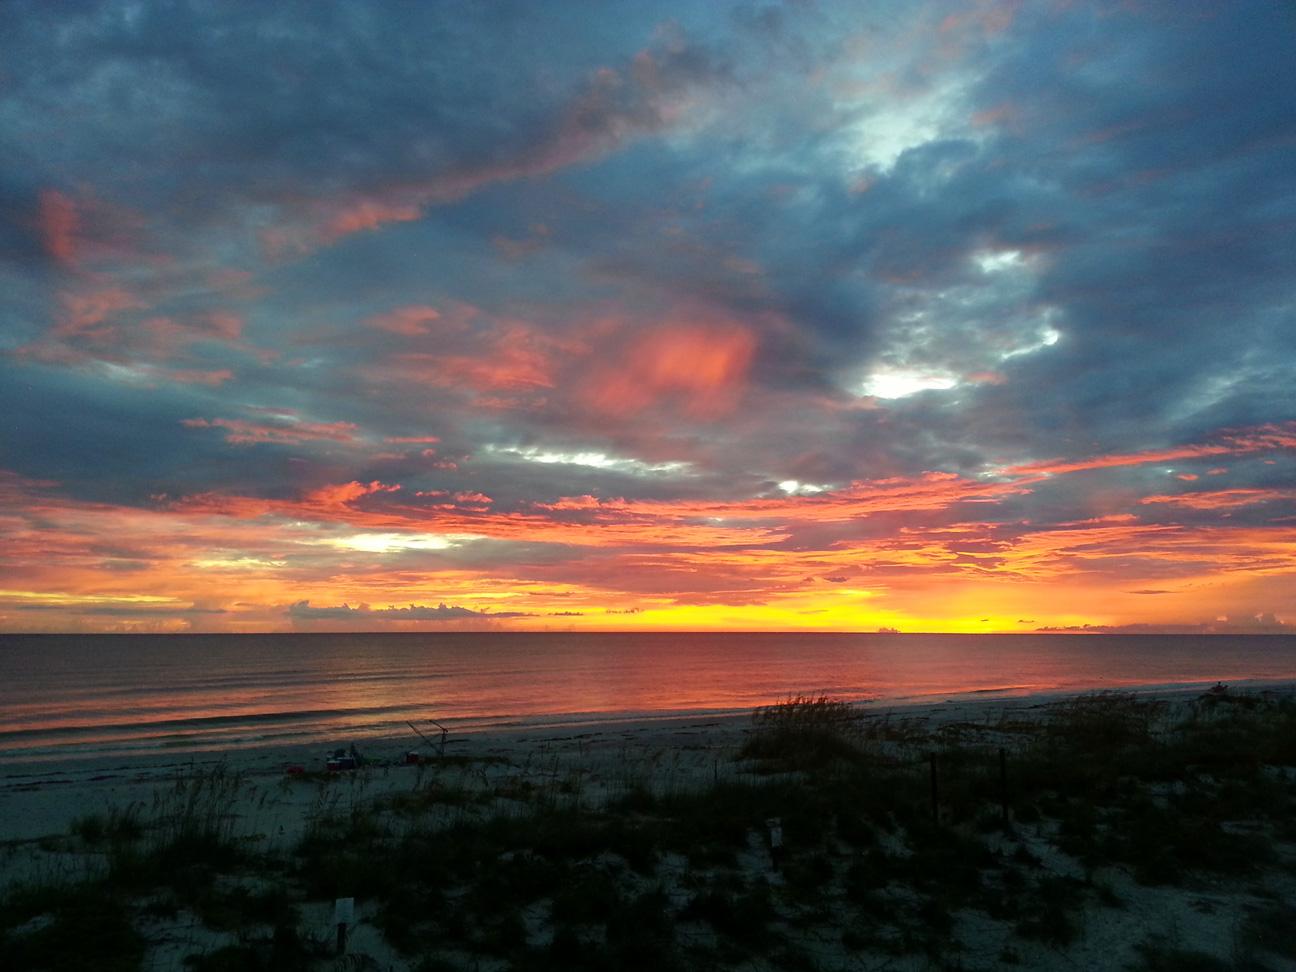 Blazing sunsets